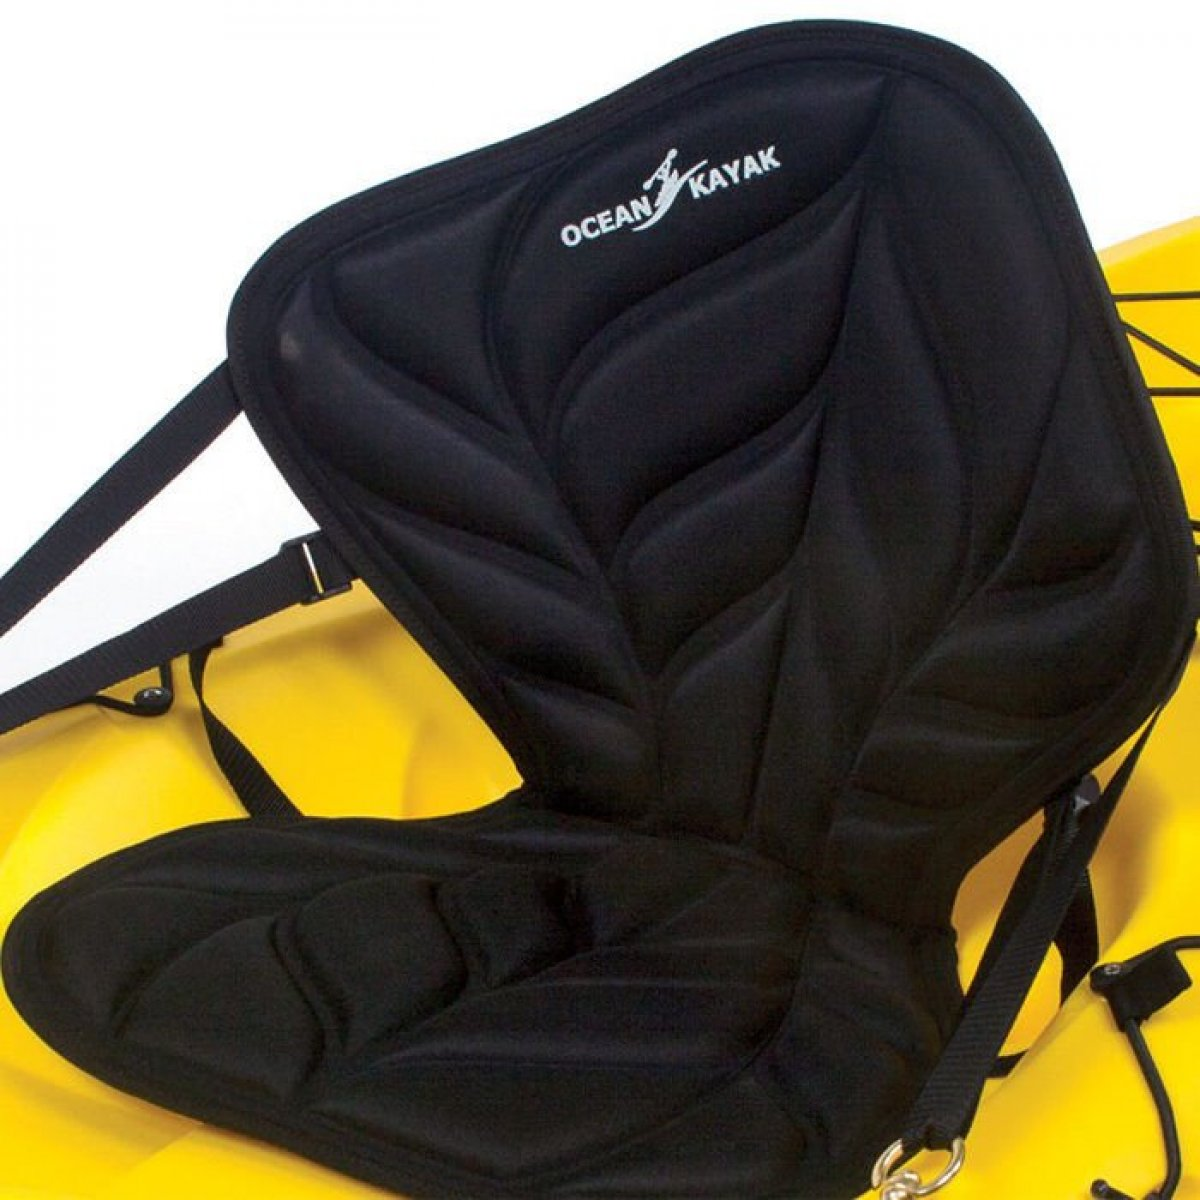 OCEAN KAYAK COMFORT ZONE SEAT BACKS = $ 145.00 - 2 ONLY